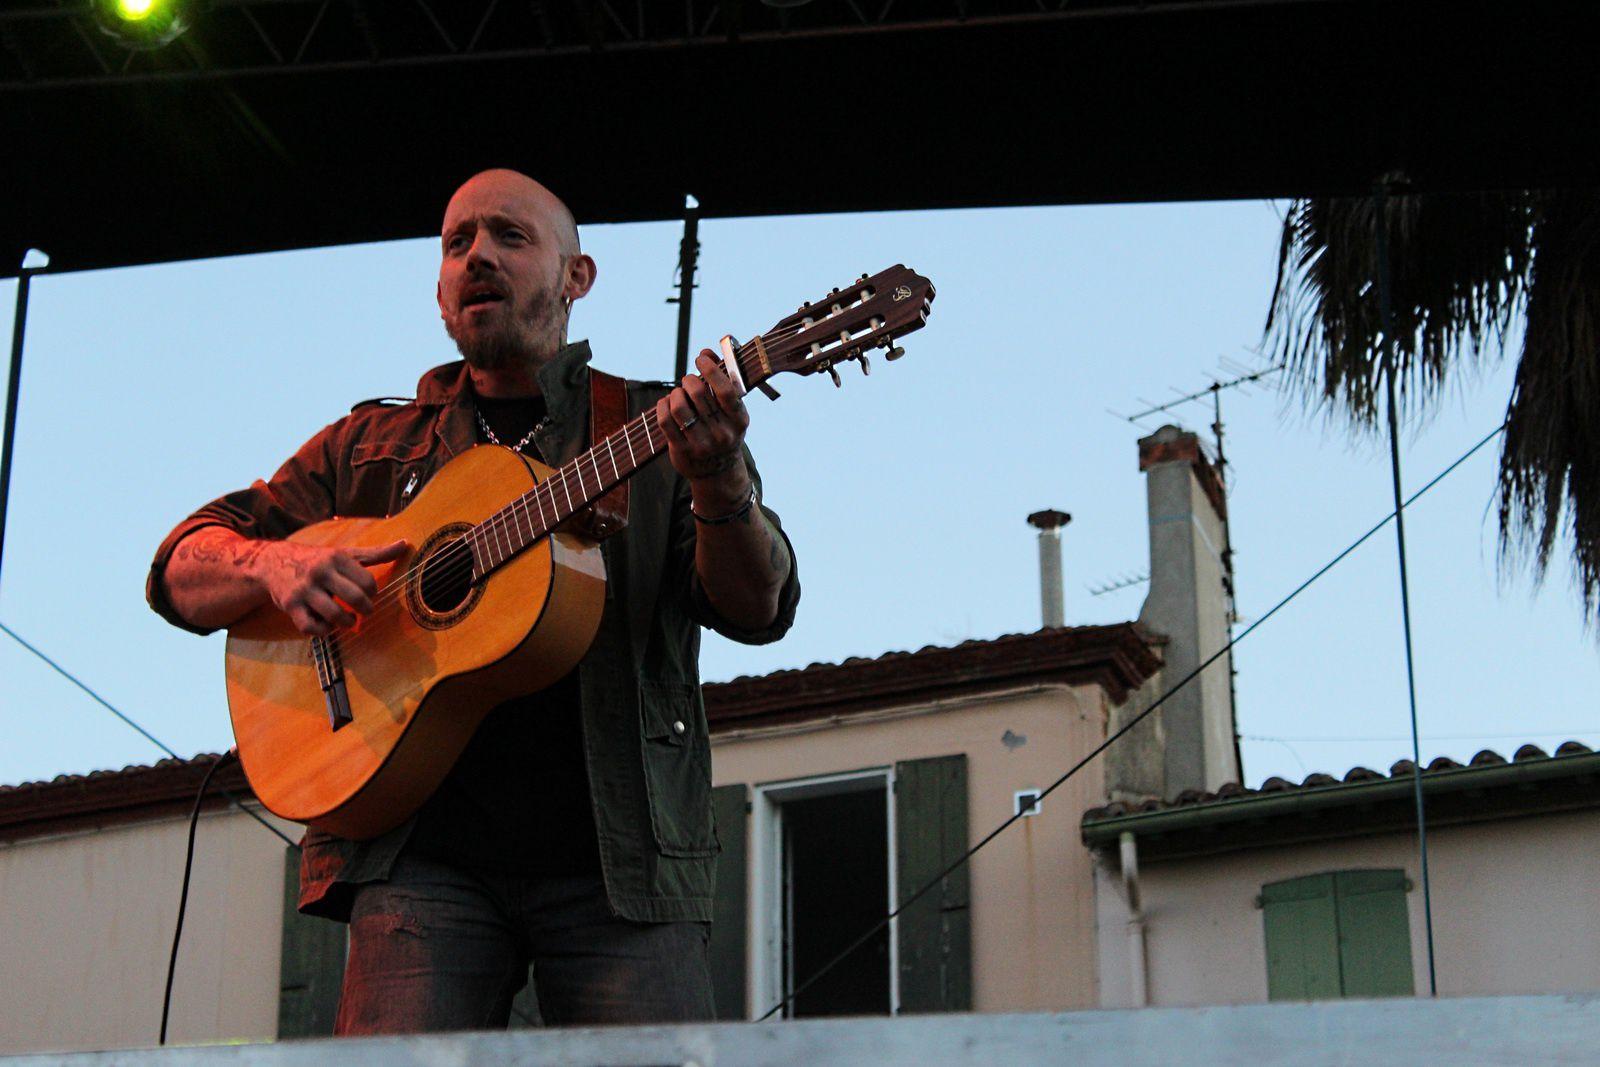 Concert Bilbano Medellin